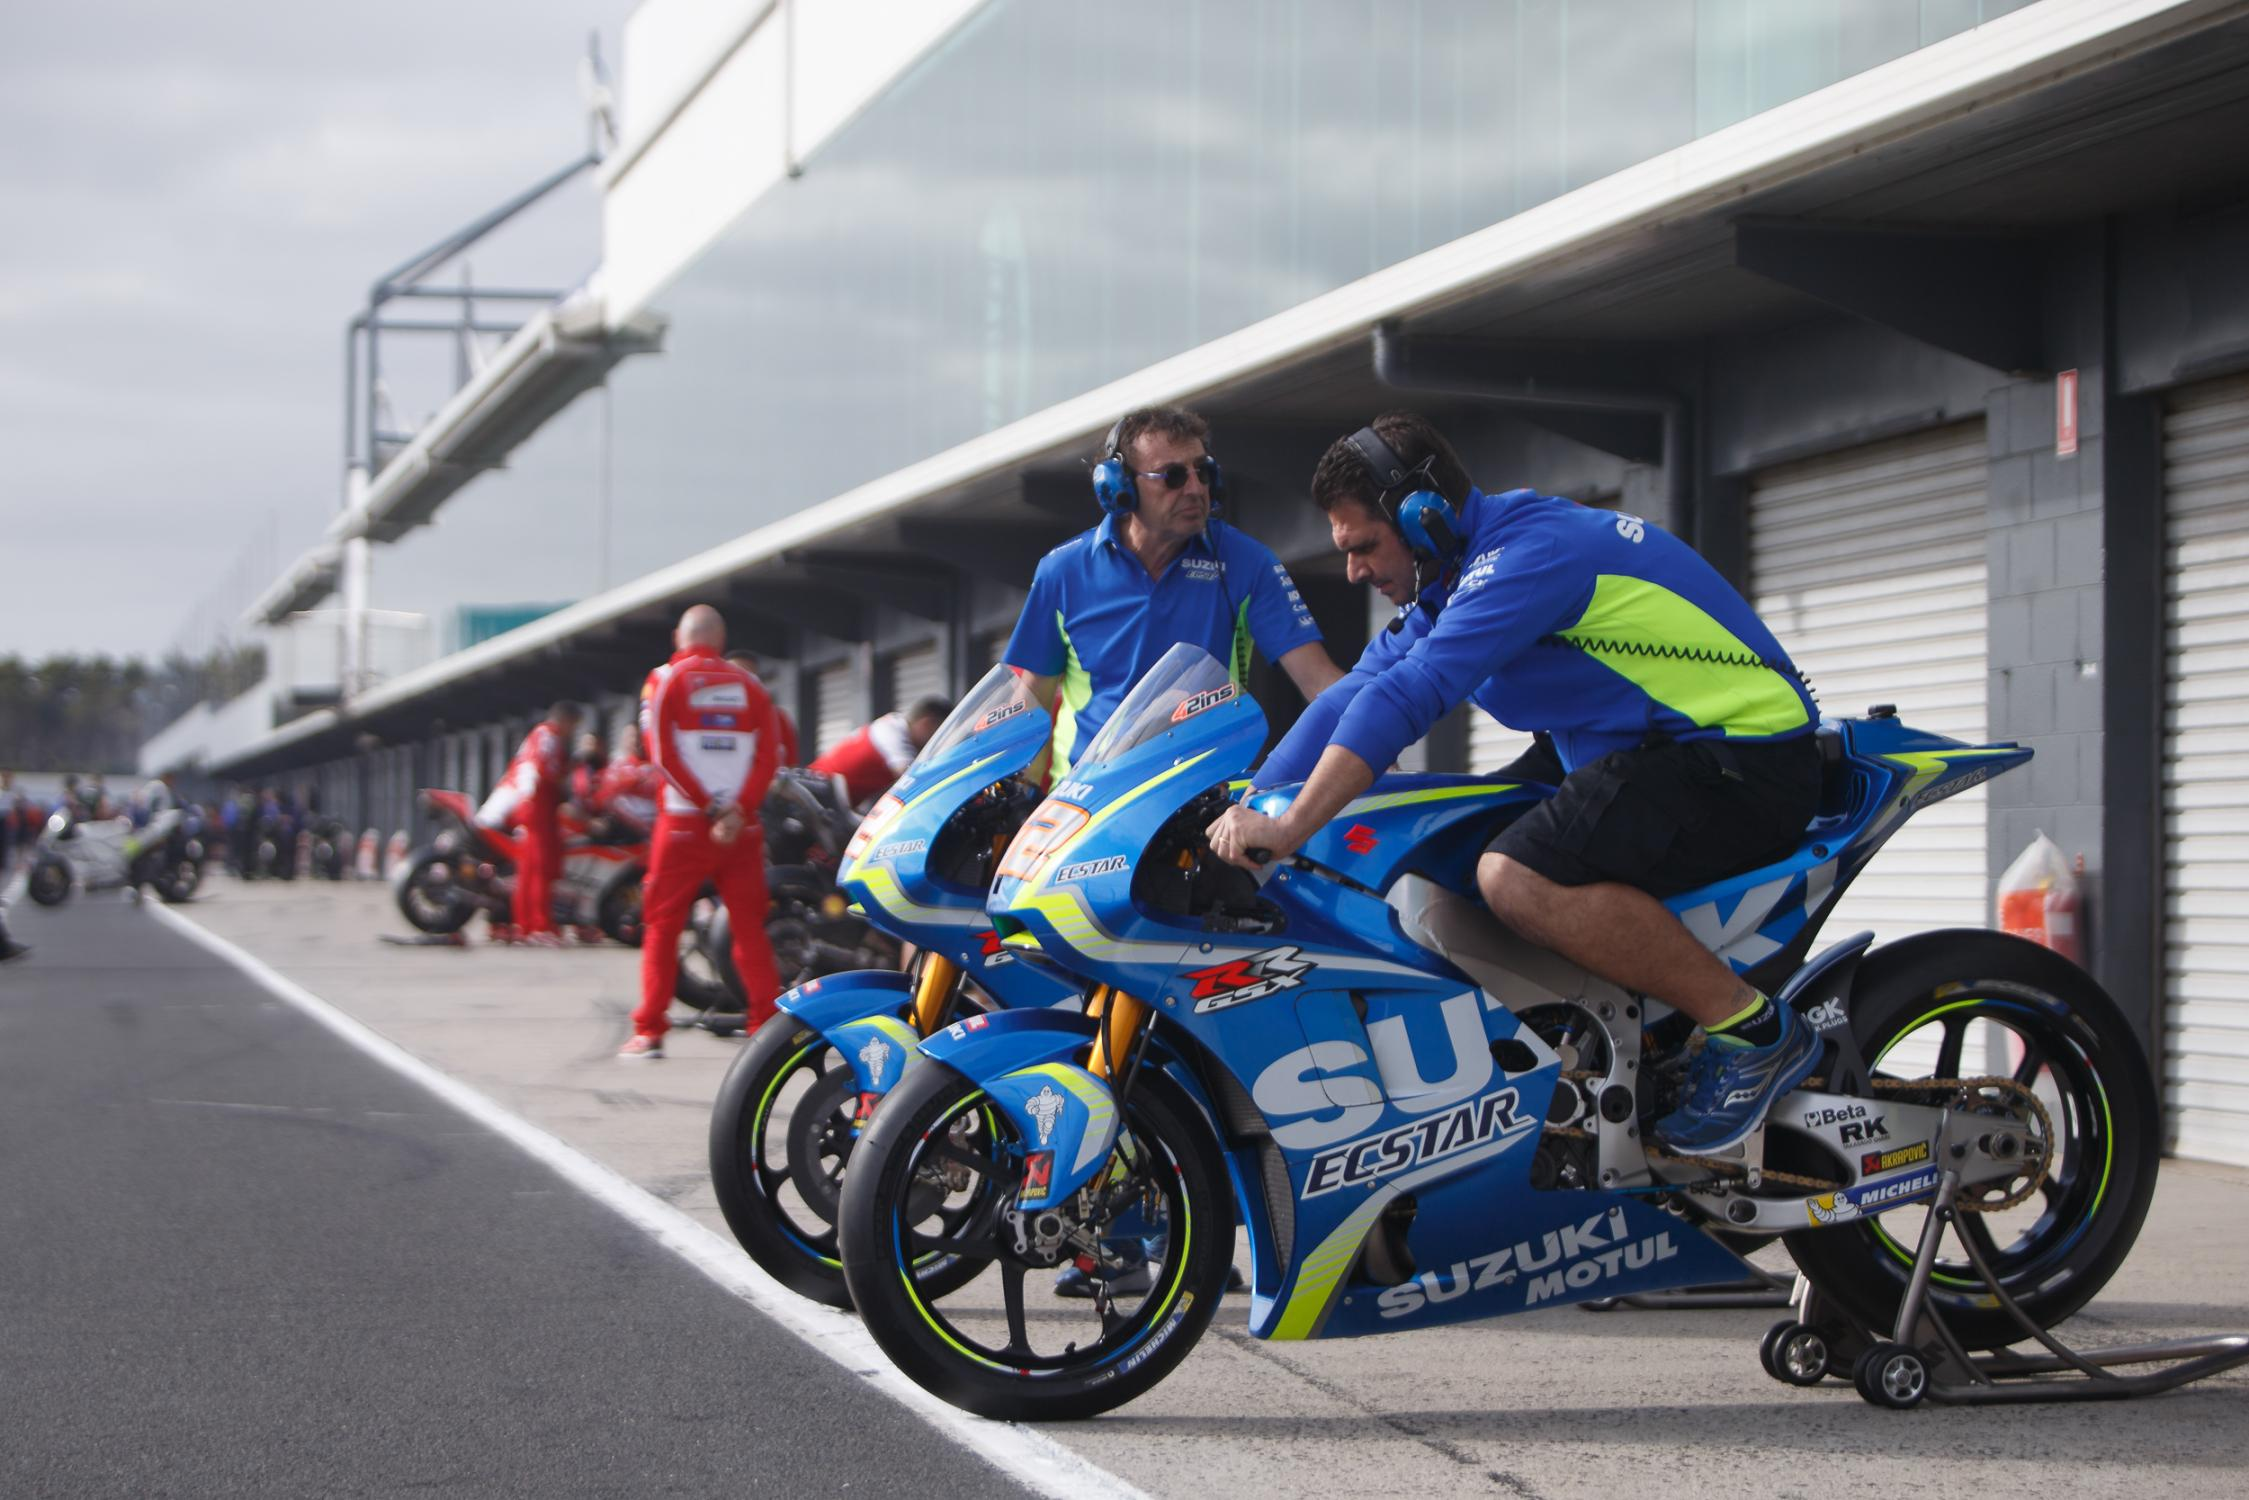 [MotoGP] Test Phillip Island 00363_test2017_ambience_0.gallery_full_top_fullscreen